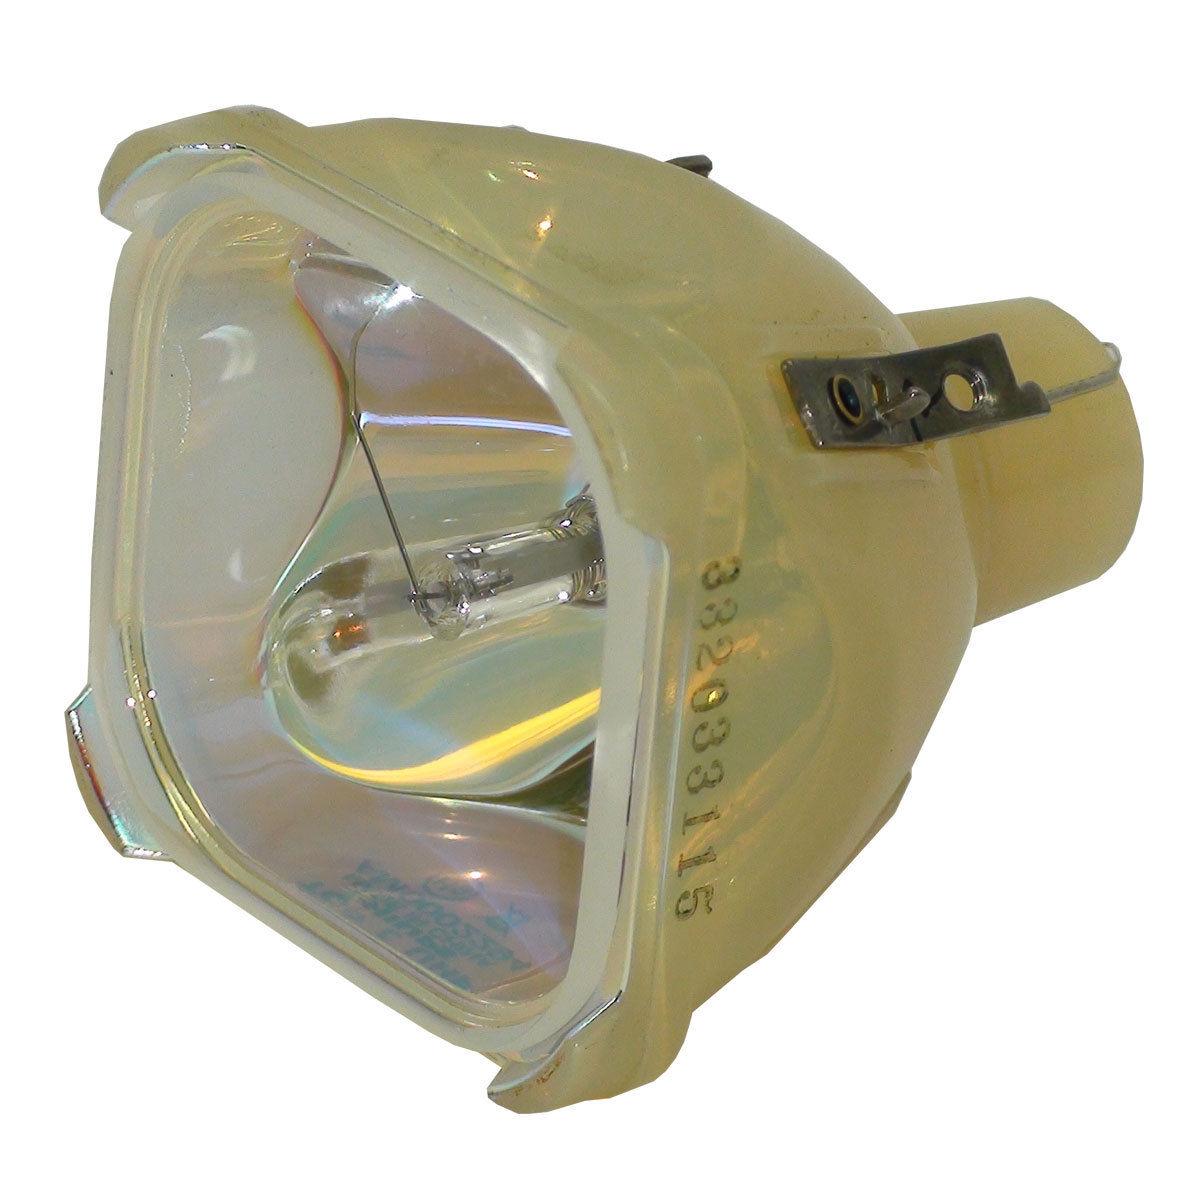 Compatible Bare Bulb POA-LMP86 LMP86 610-317-5355 for SANYO PLV-Z3 PLV-Z1X Projector Lamp Bulb without housing Free Shipping projector lamp lmp86 without housing for plv z1x z3 sanyo